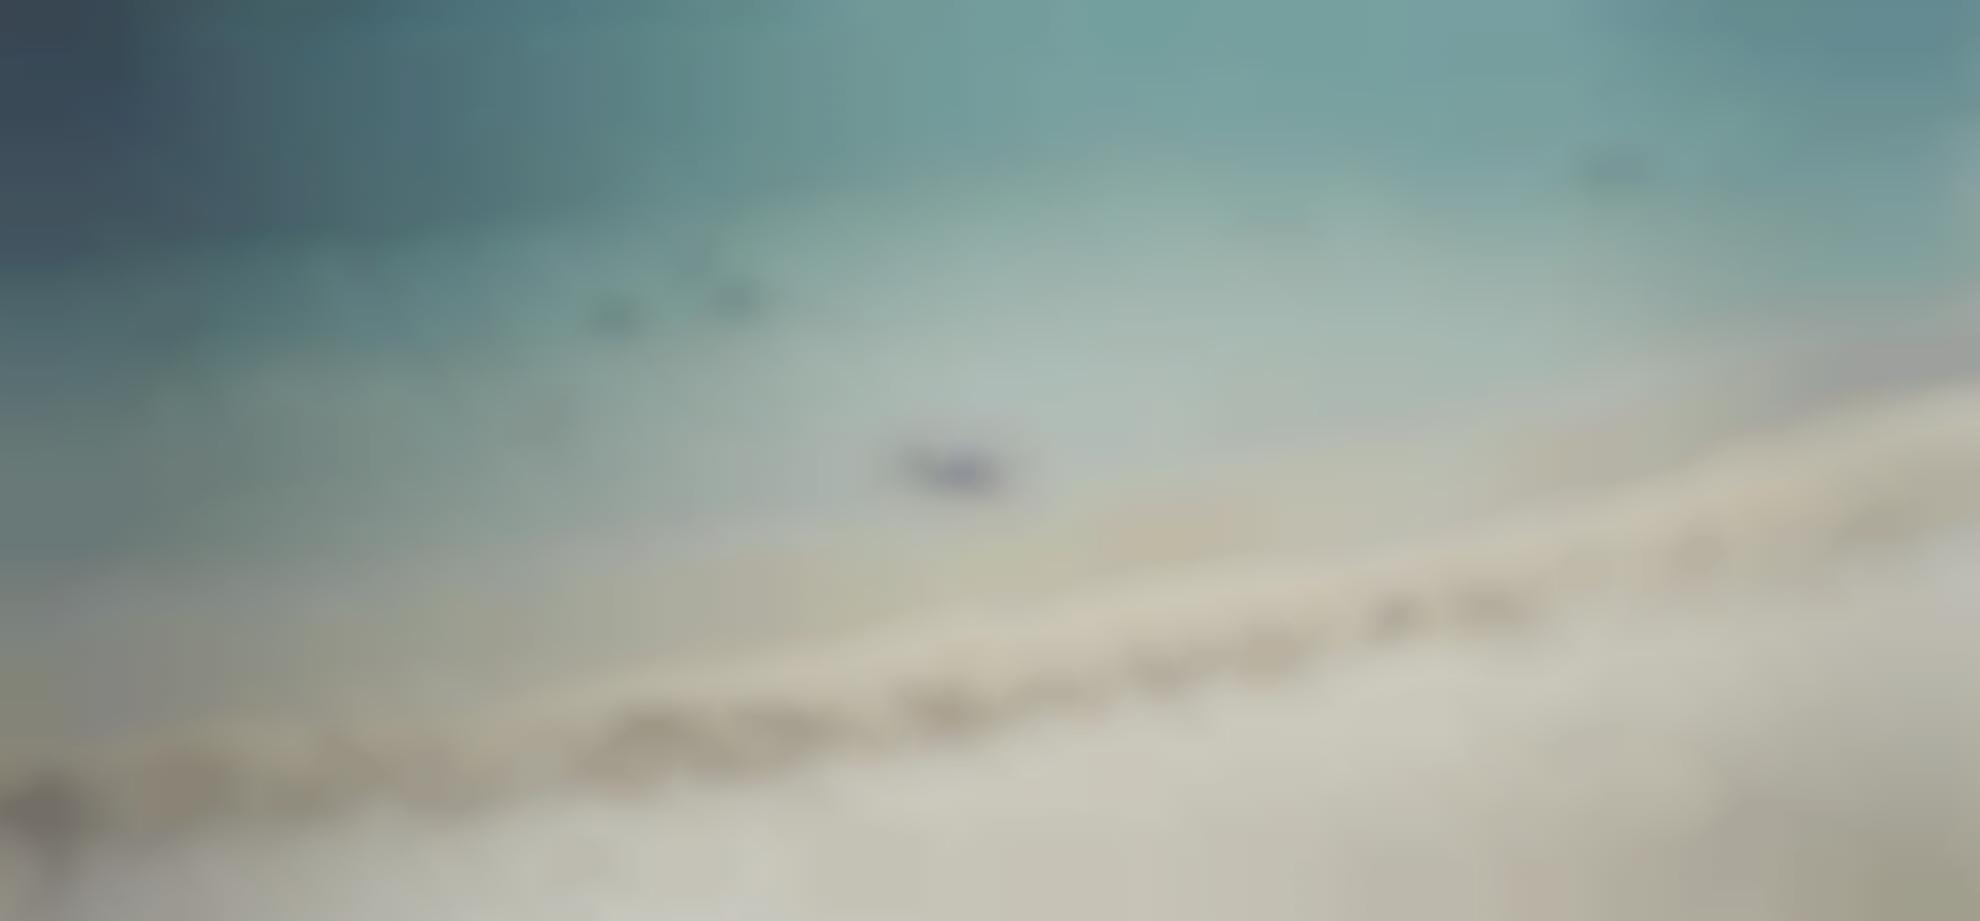 Richard Misrach-Untitled #892-03 (From On The Beach)-2003